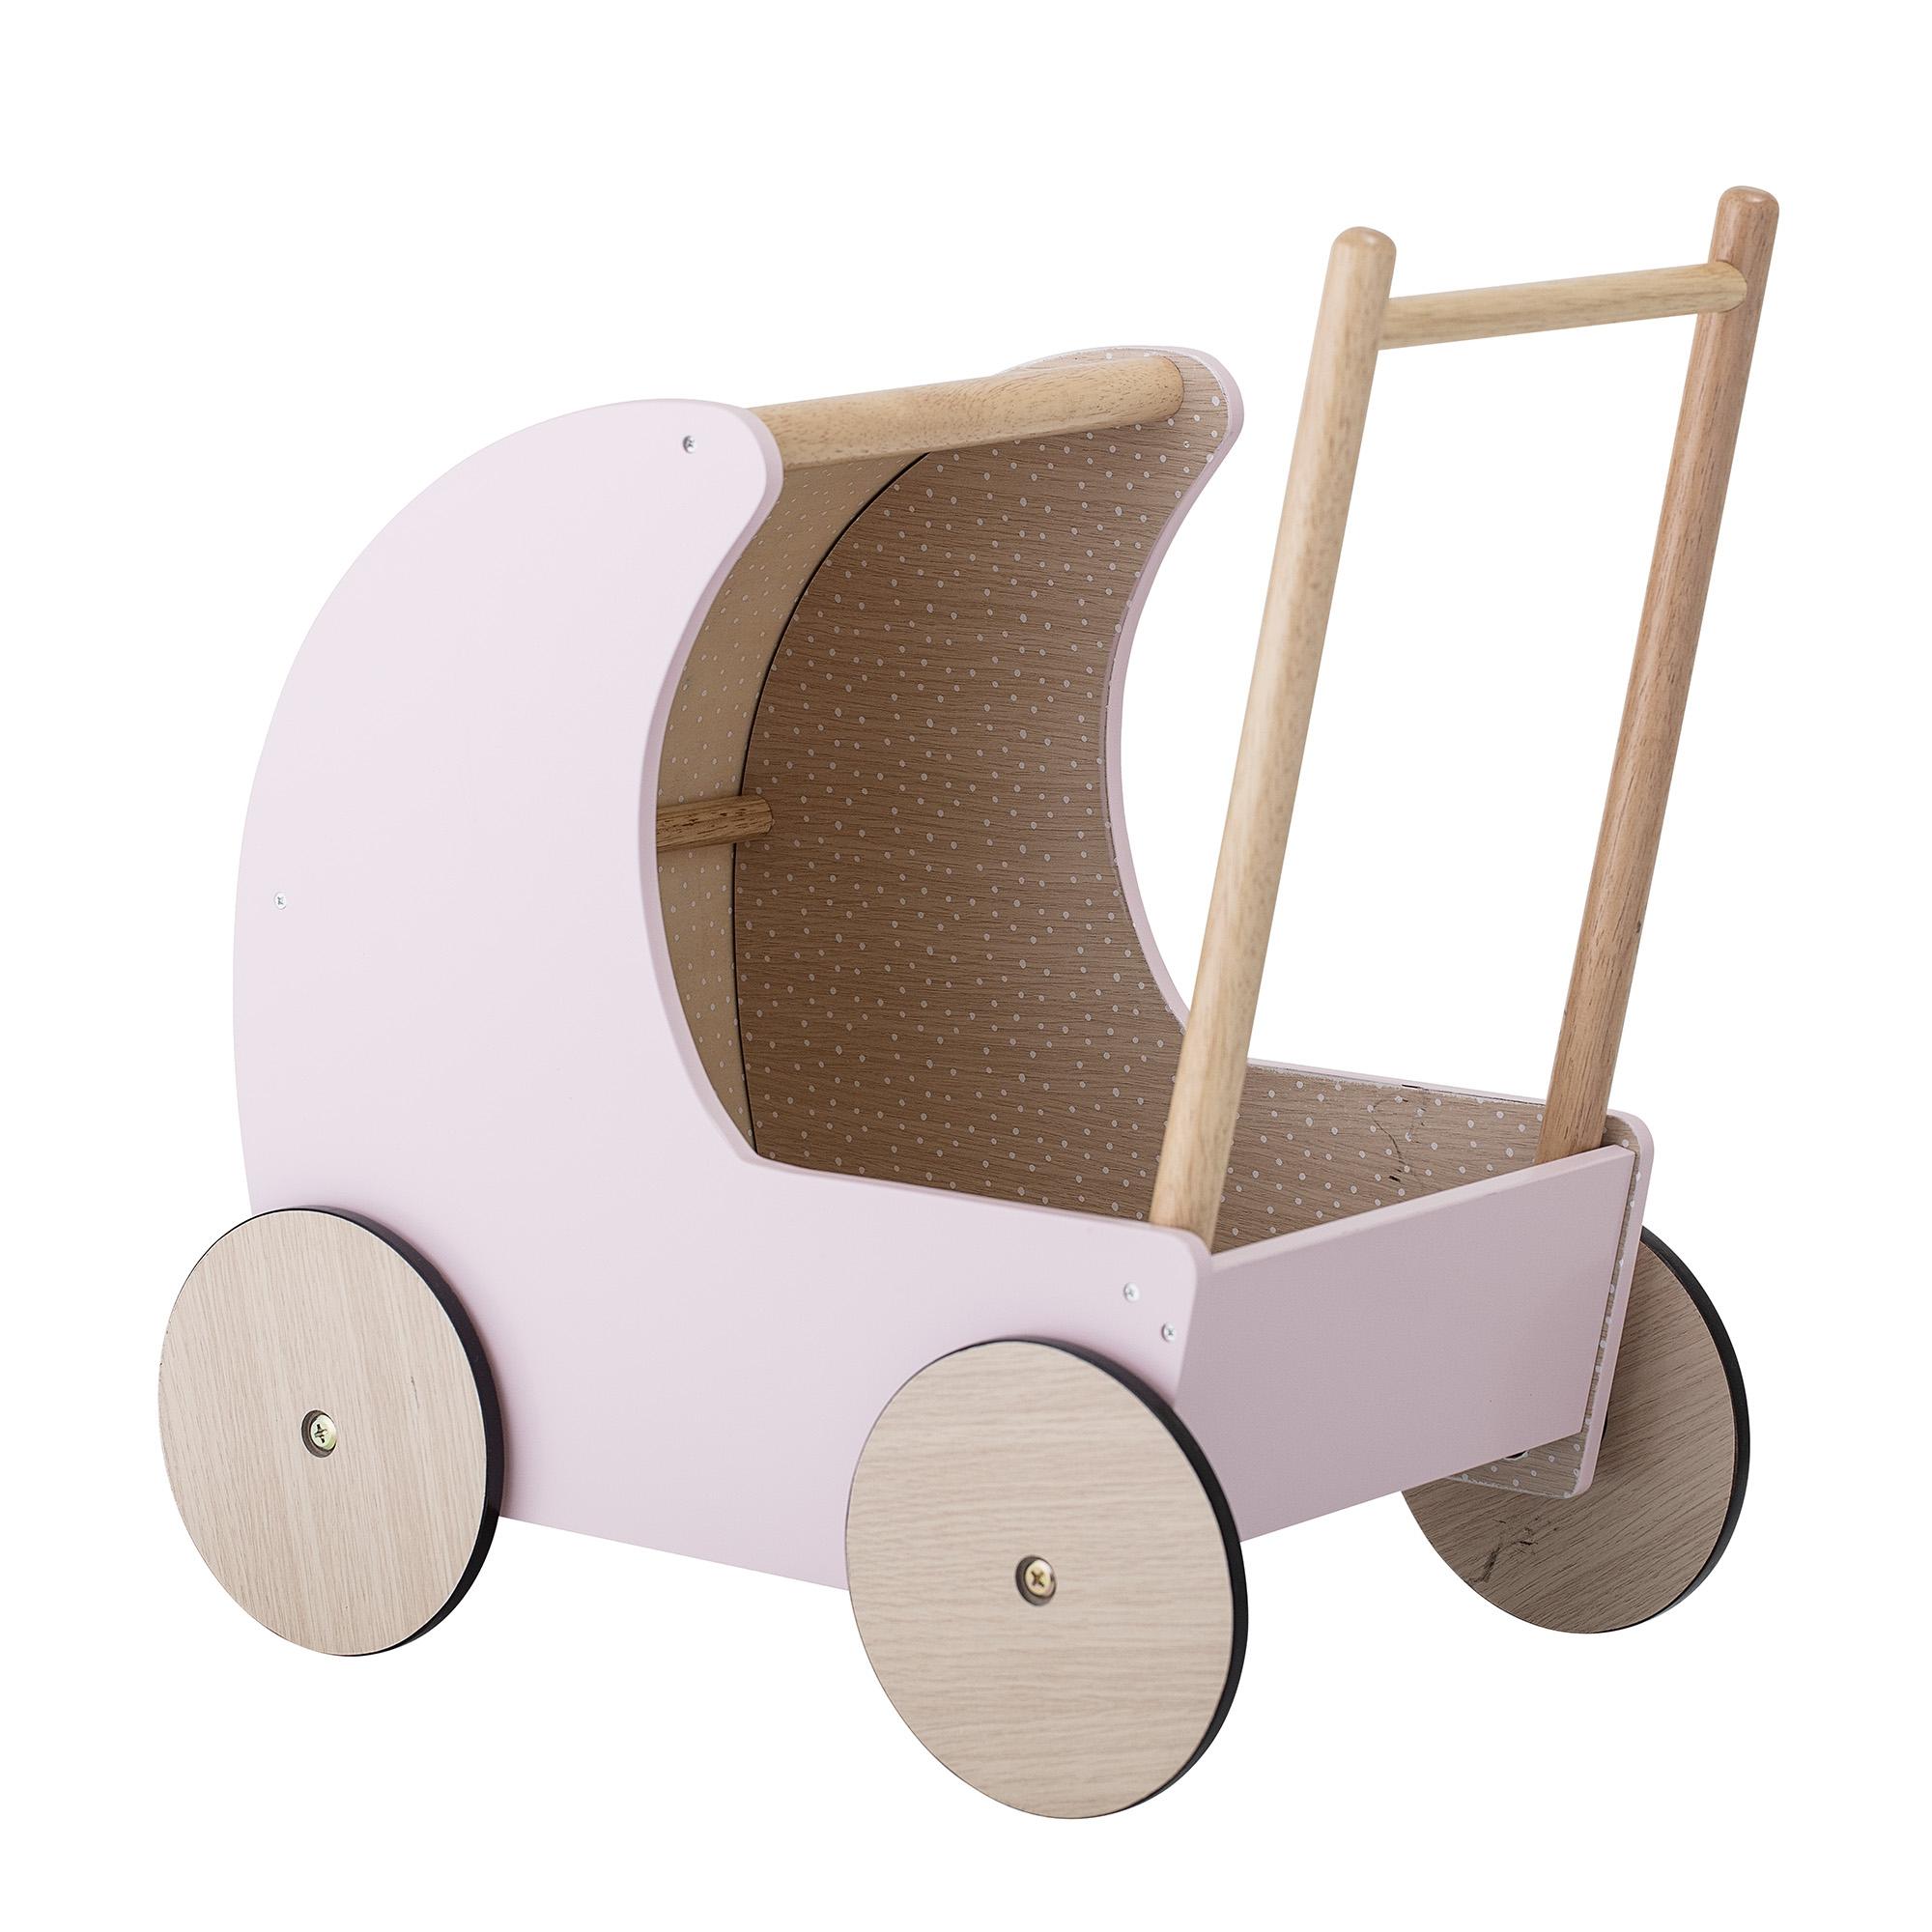 Carucior pentru copii Toy Pram din MDF, Rose, L50xl25xh40 cm din categoria Mobiler copii